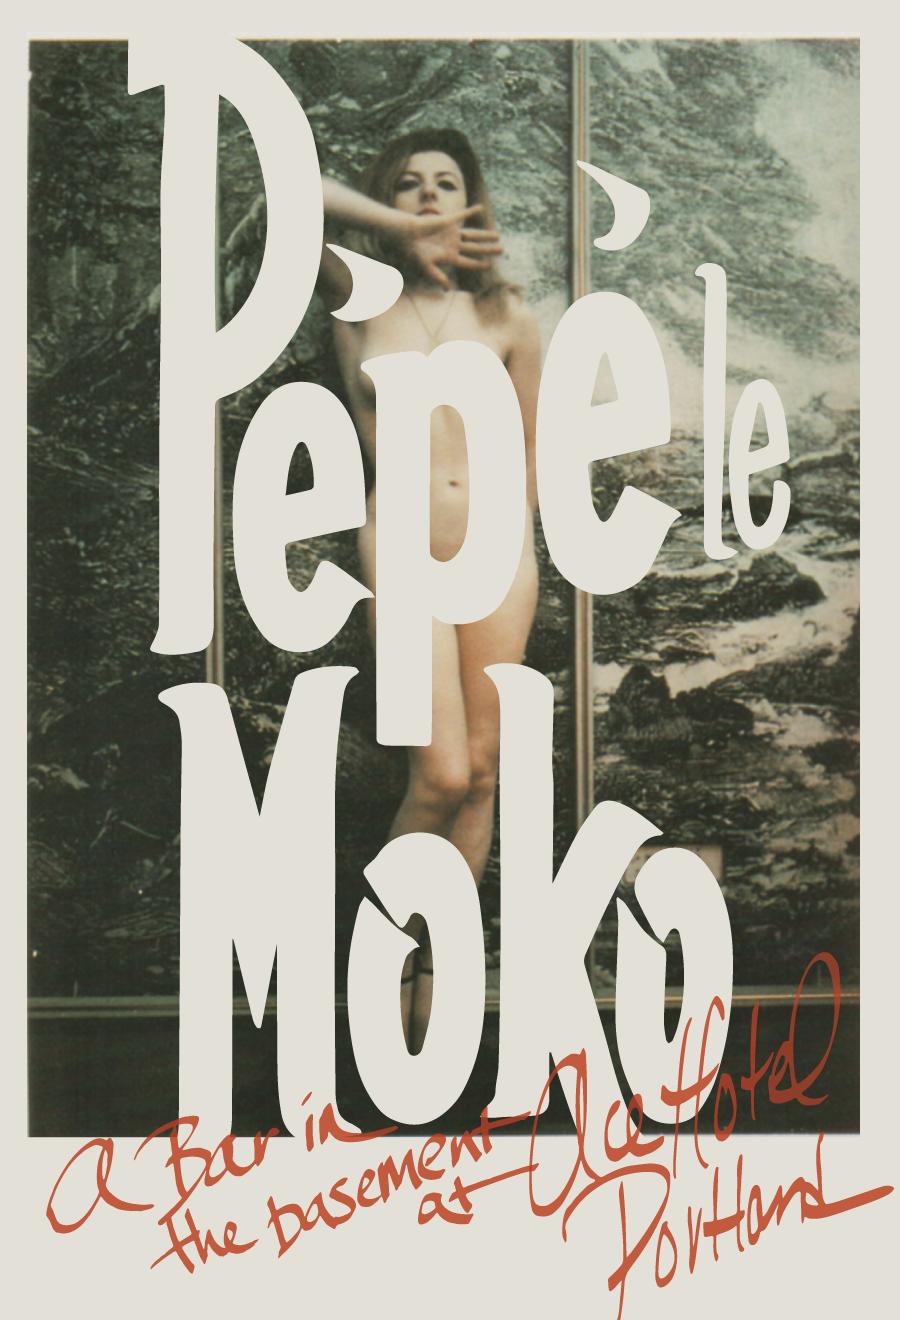 Pepe_autograph_postcard-PRINT.png